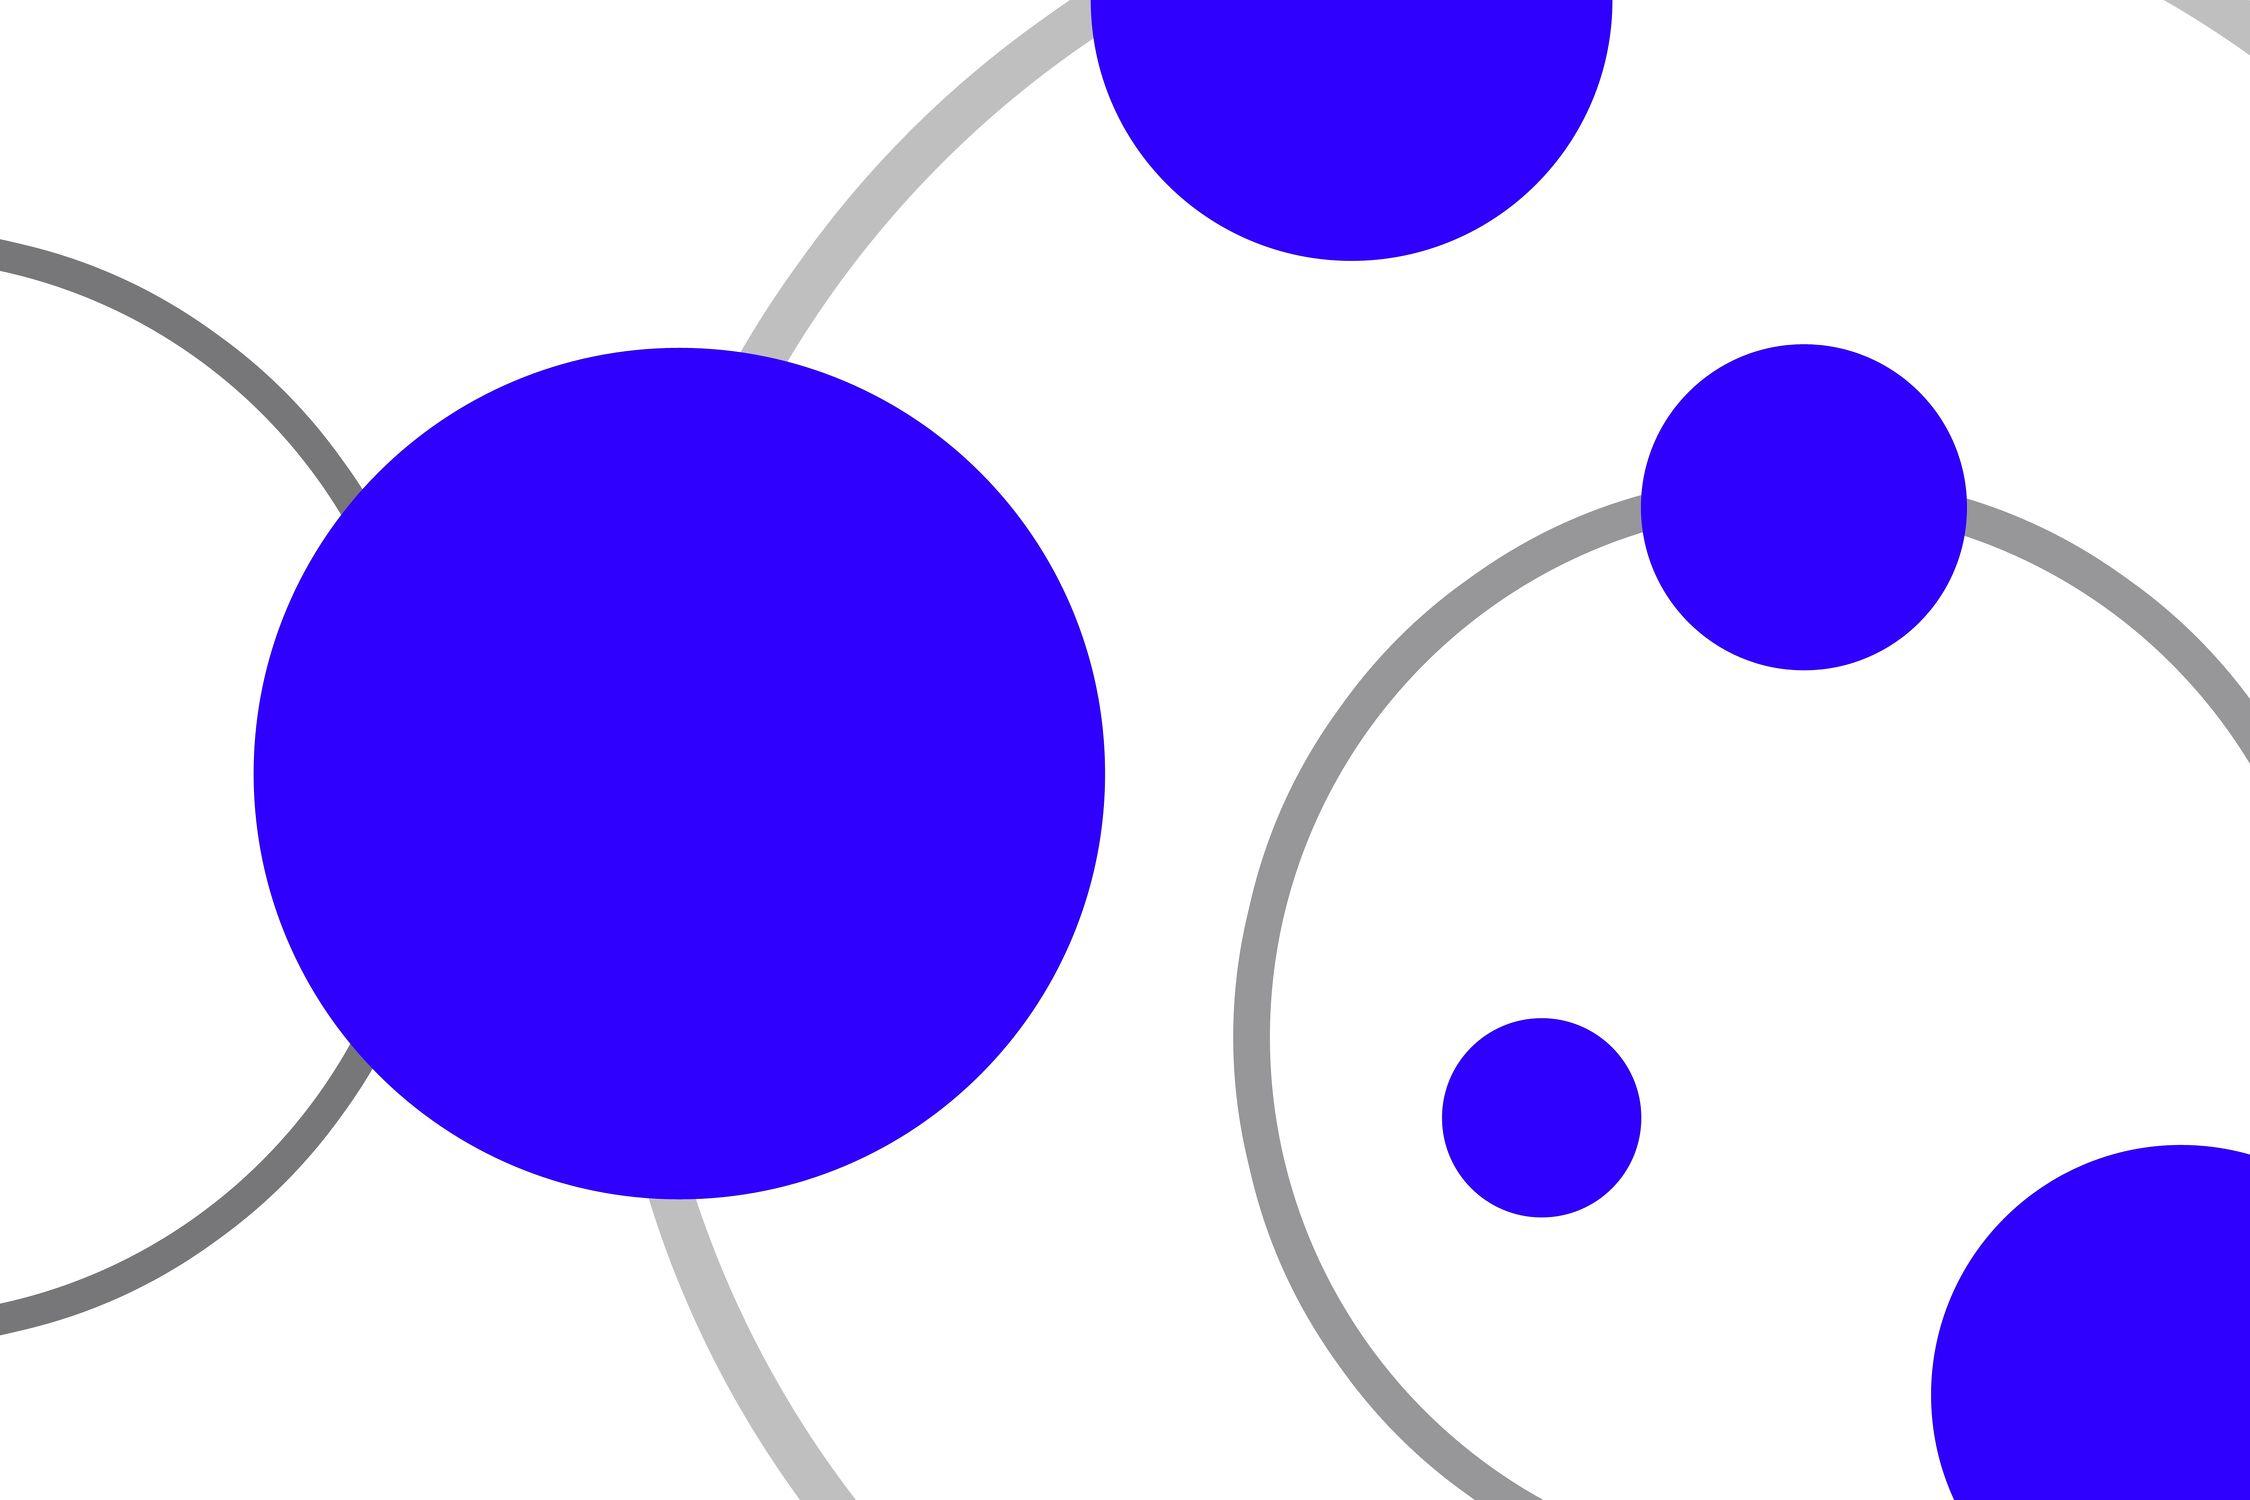 Bild mit Farben, Lila, Violett, Blau, Abstrakt, Abstrakte Kunst, Retro, Retro Art, Retro style